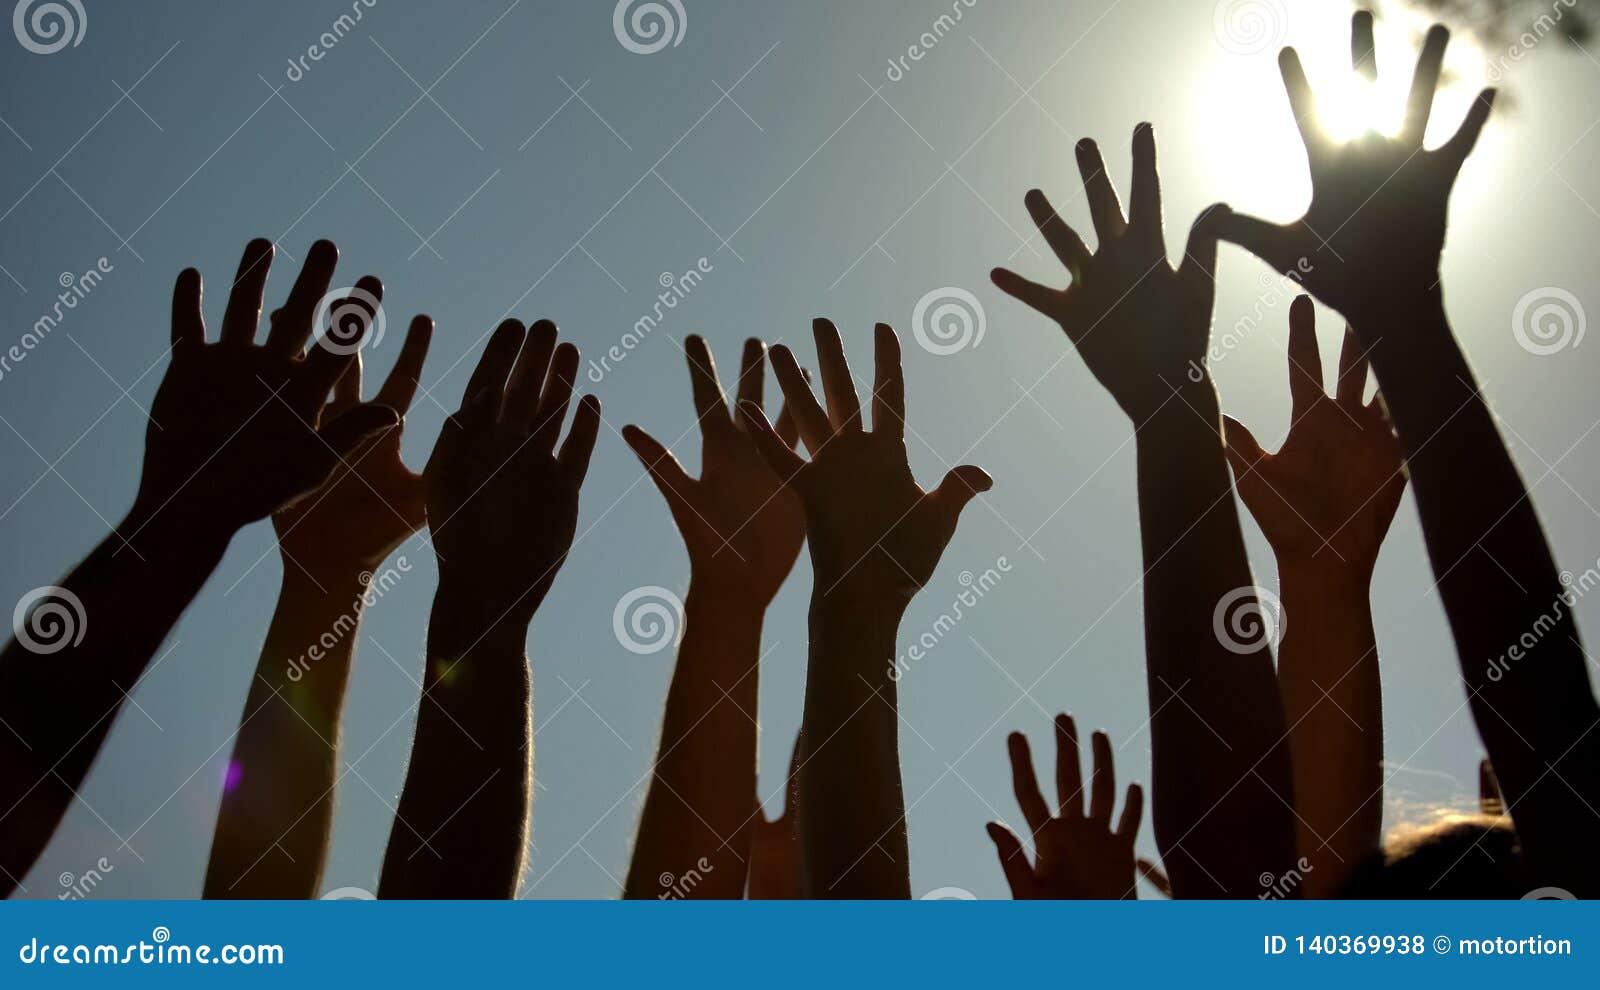 People raising hands, voting for democracy, volunteering campaign, leadership